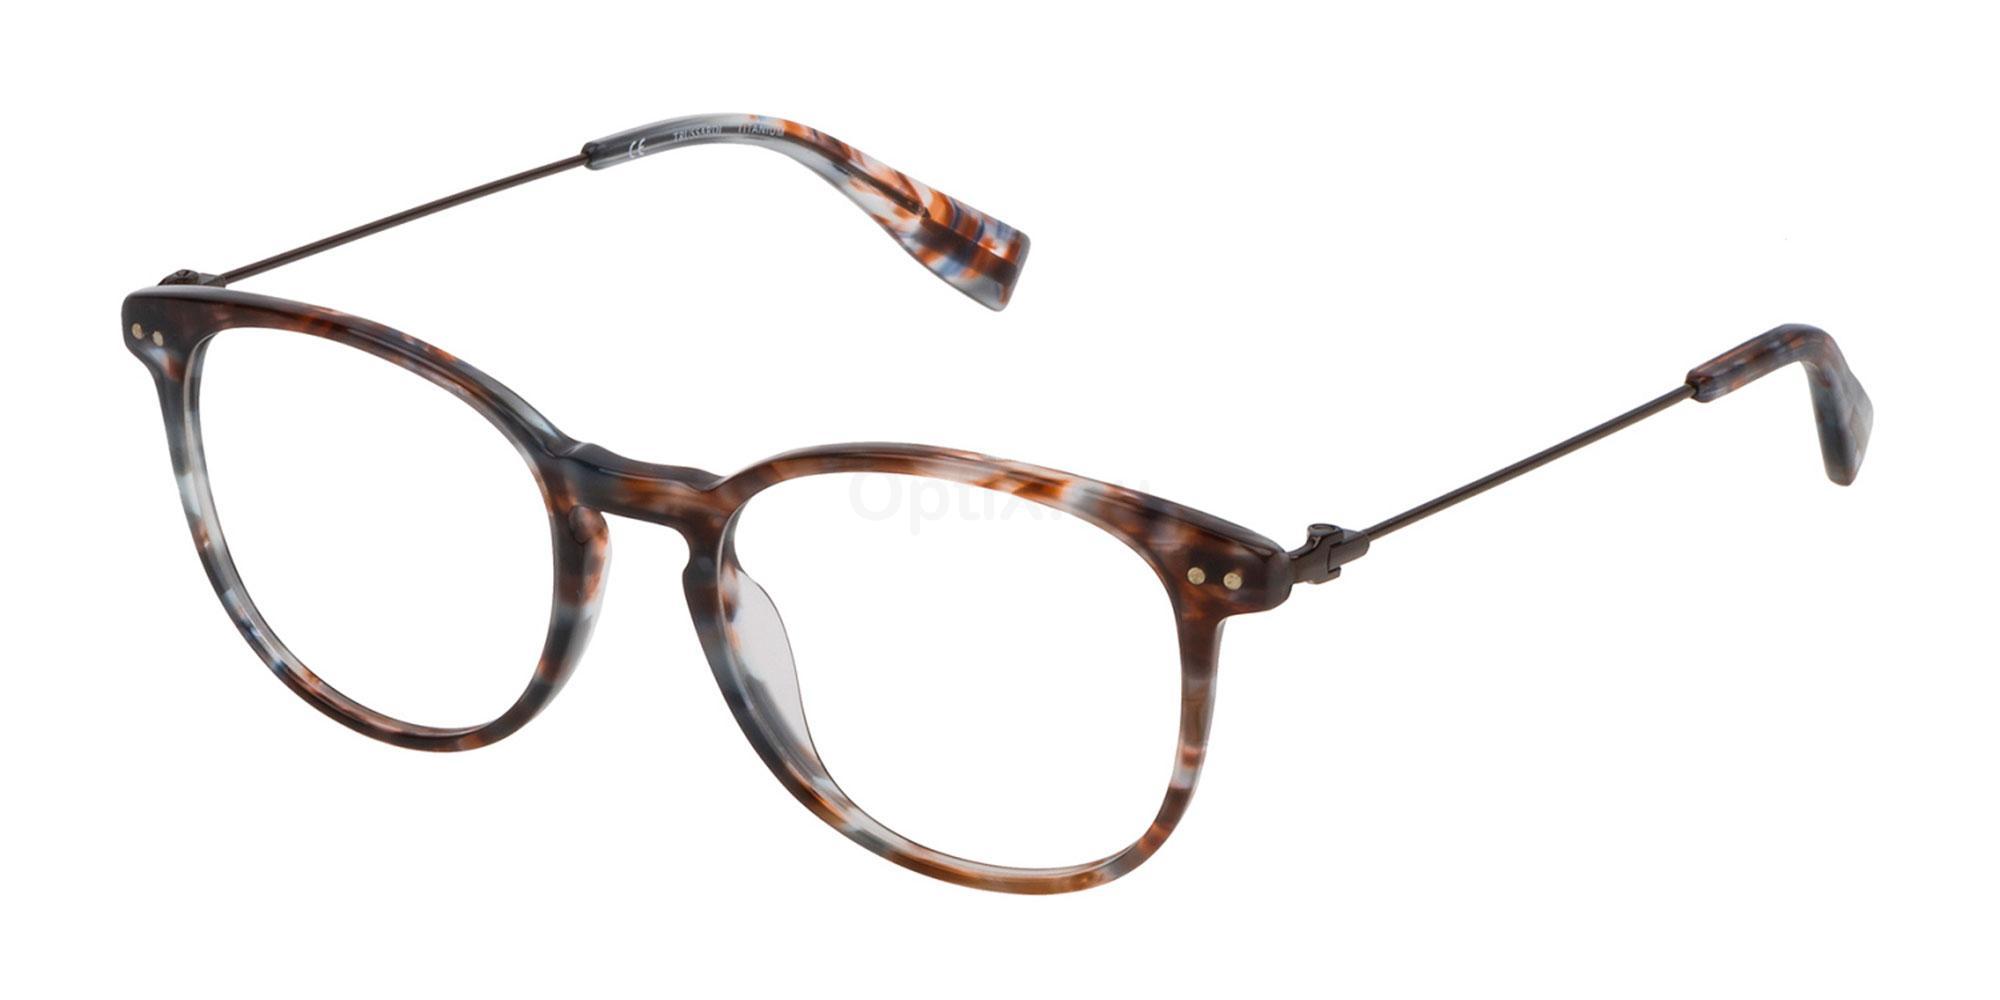 07HI VTR245 Glasses, Trussardi